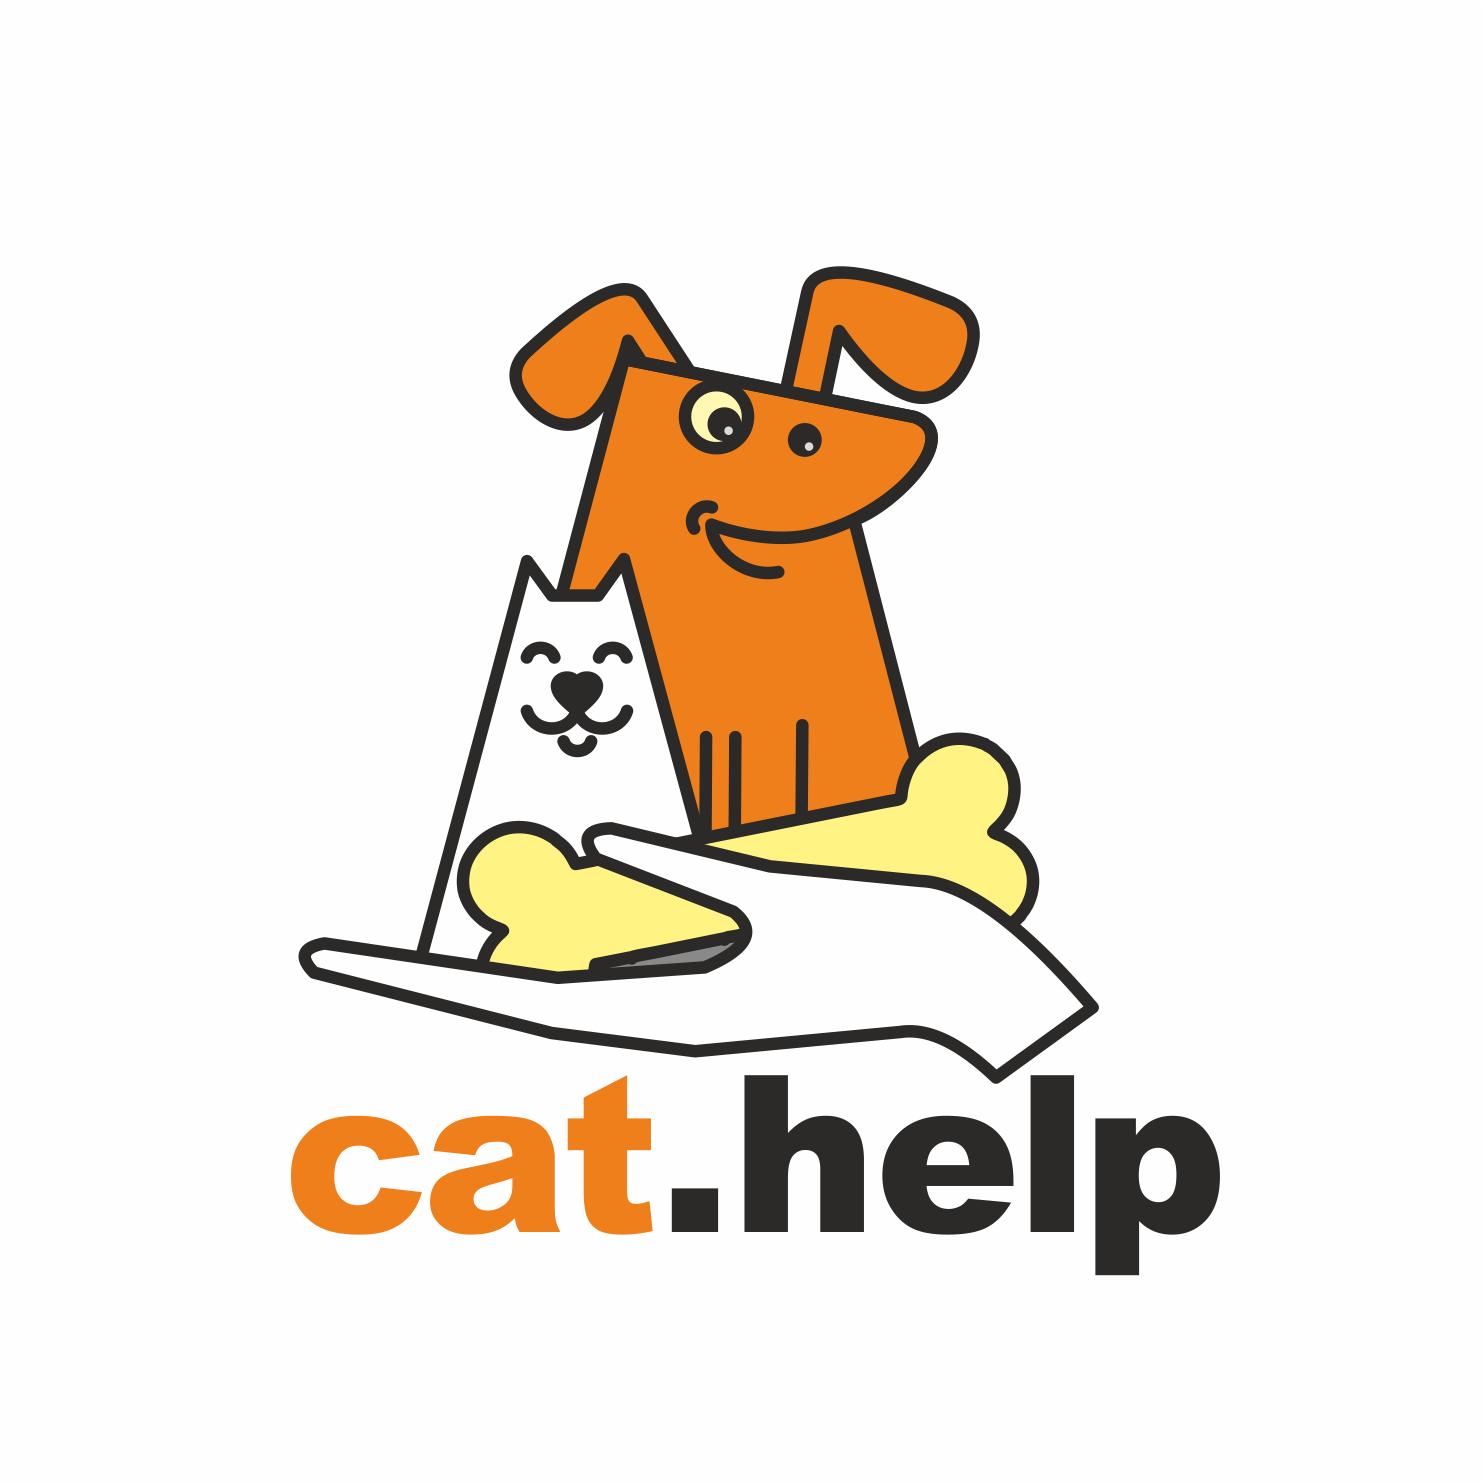 логотип для сайта и группы вк - cat.help фото f_24659db47e8205a5.jpg